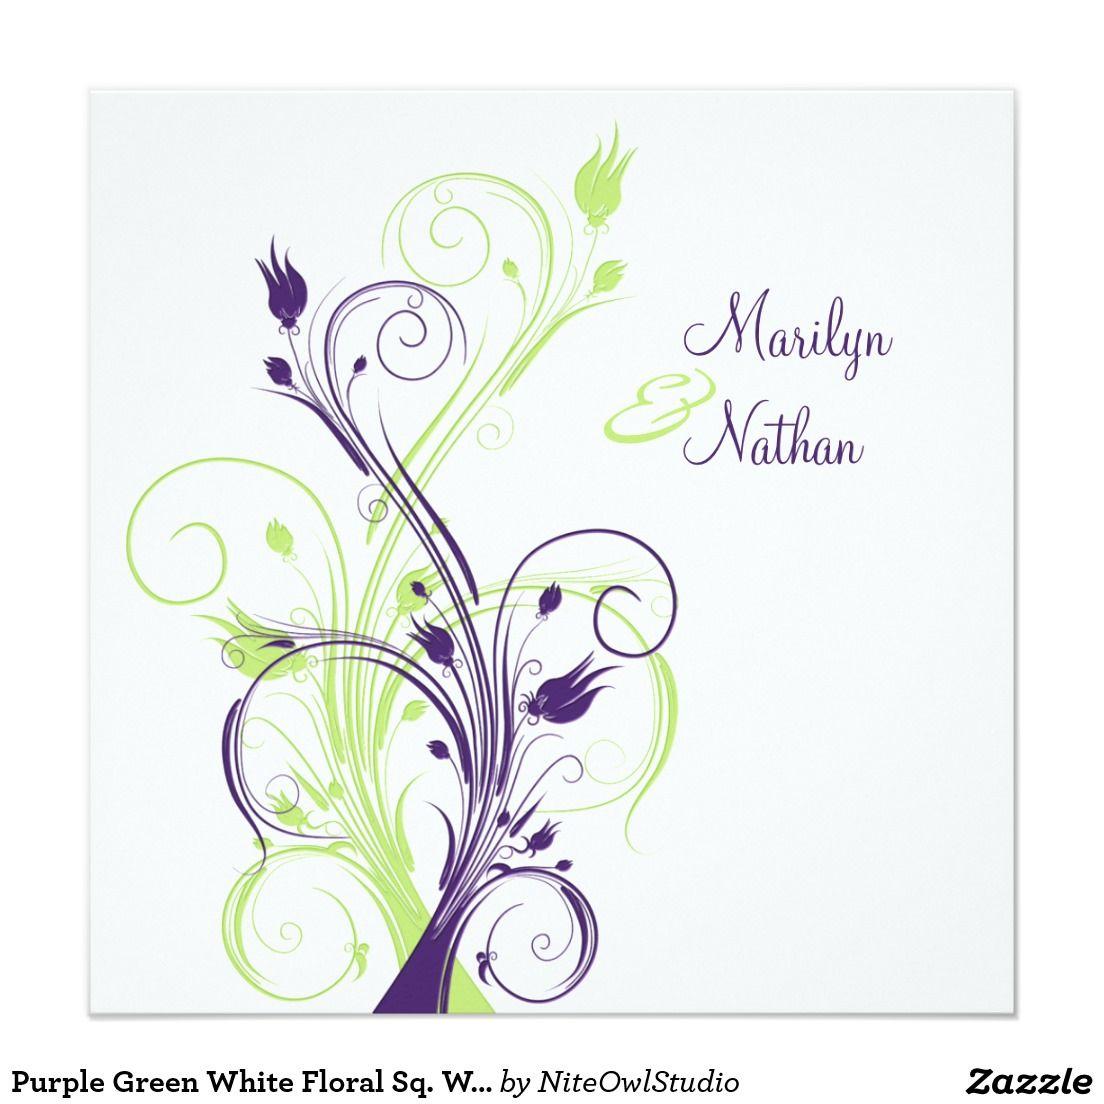 Purple Green White Floral Sq. Wedding Invitation | Weddings and ...